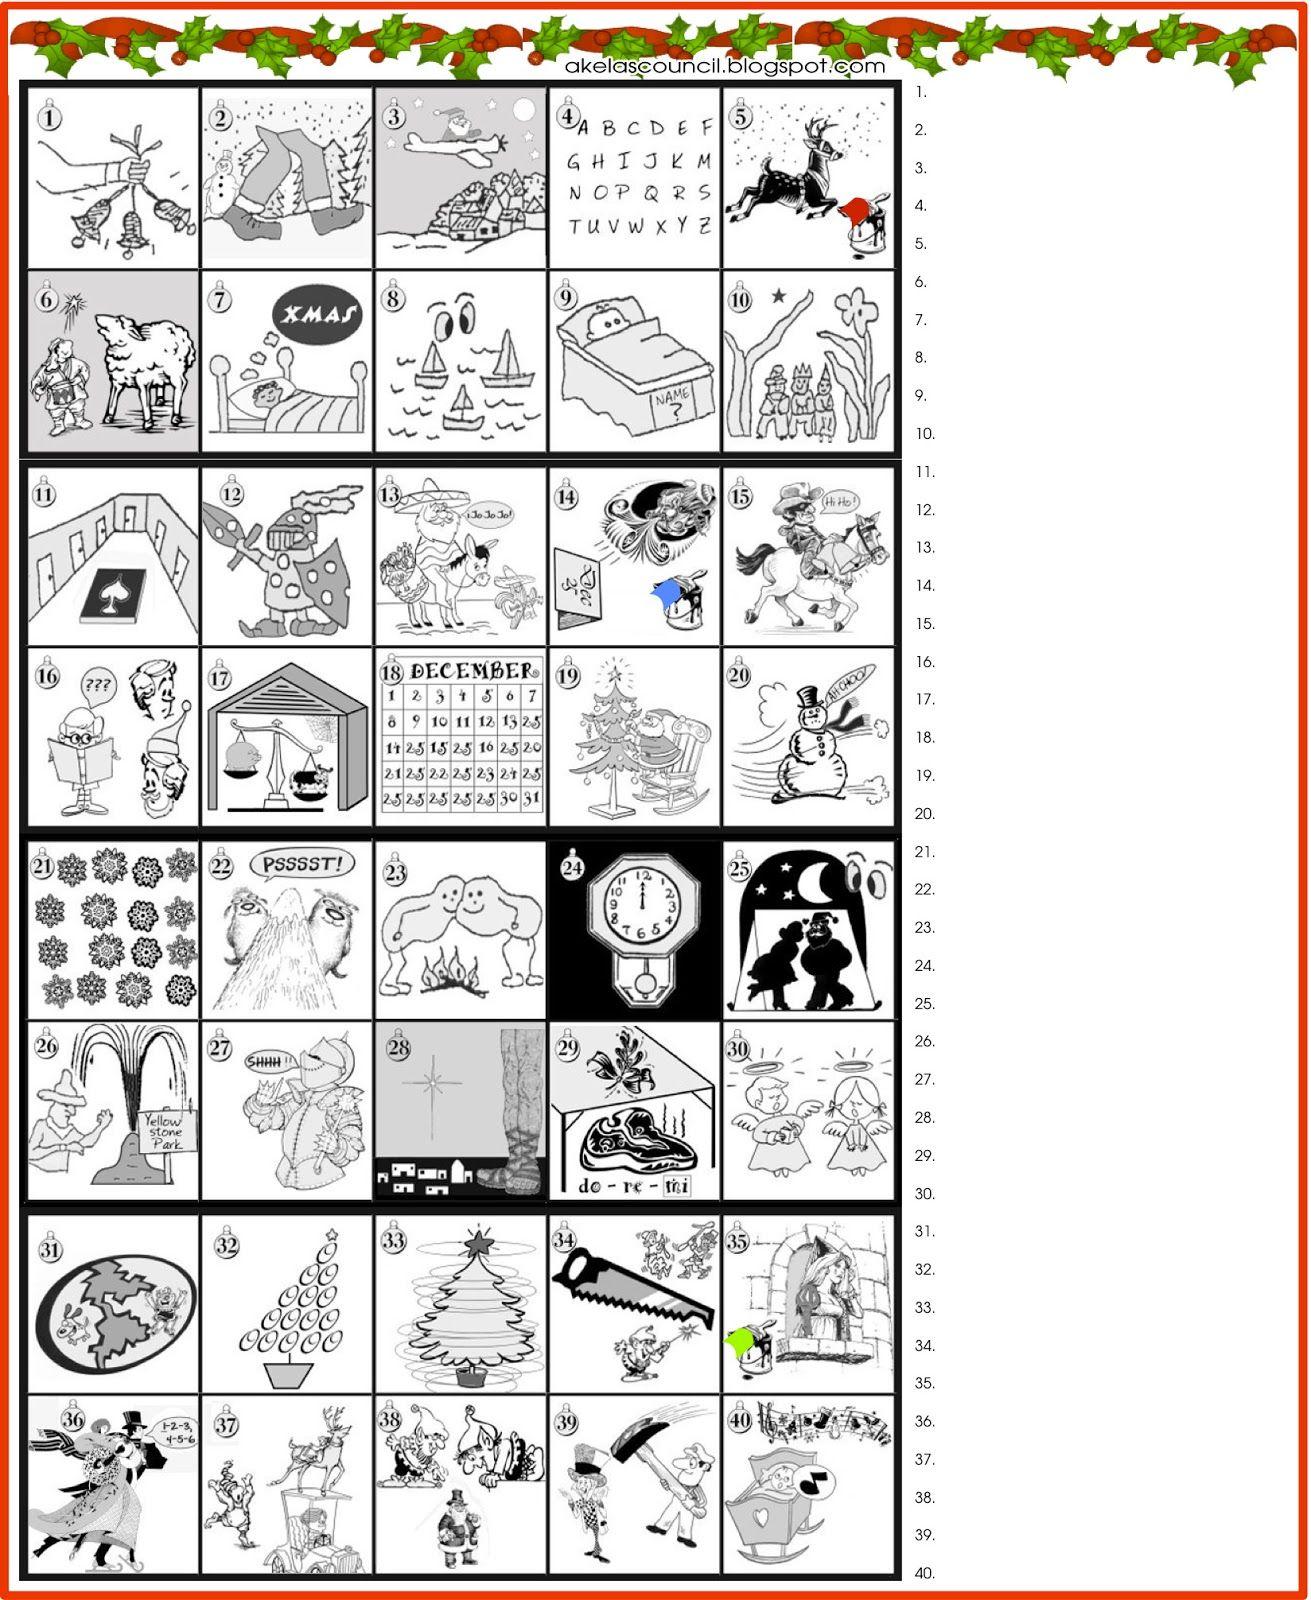 Printable * Guess The Christmas Songs Or Carols Word Puzzle - Free Printable Christmas Puzzle Sheets